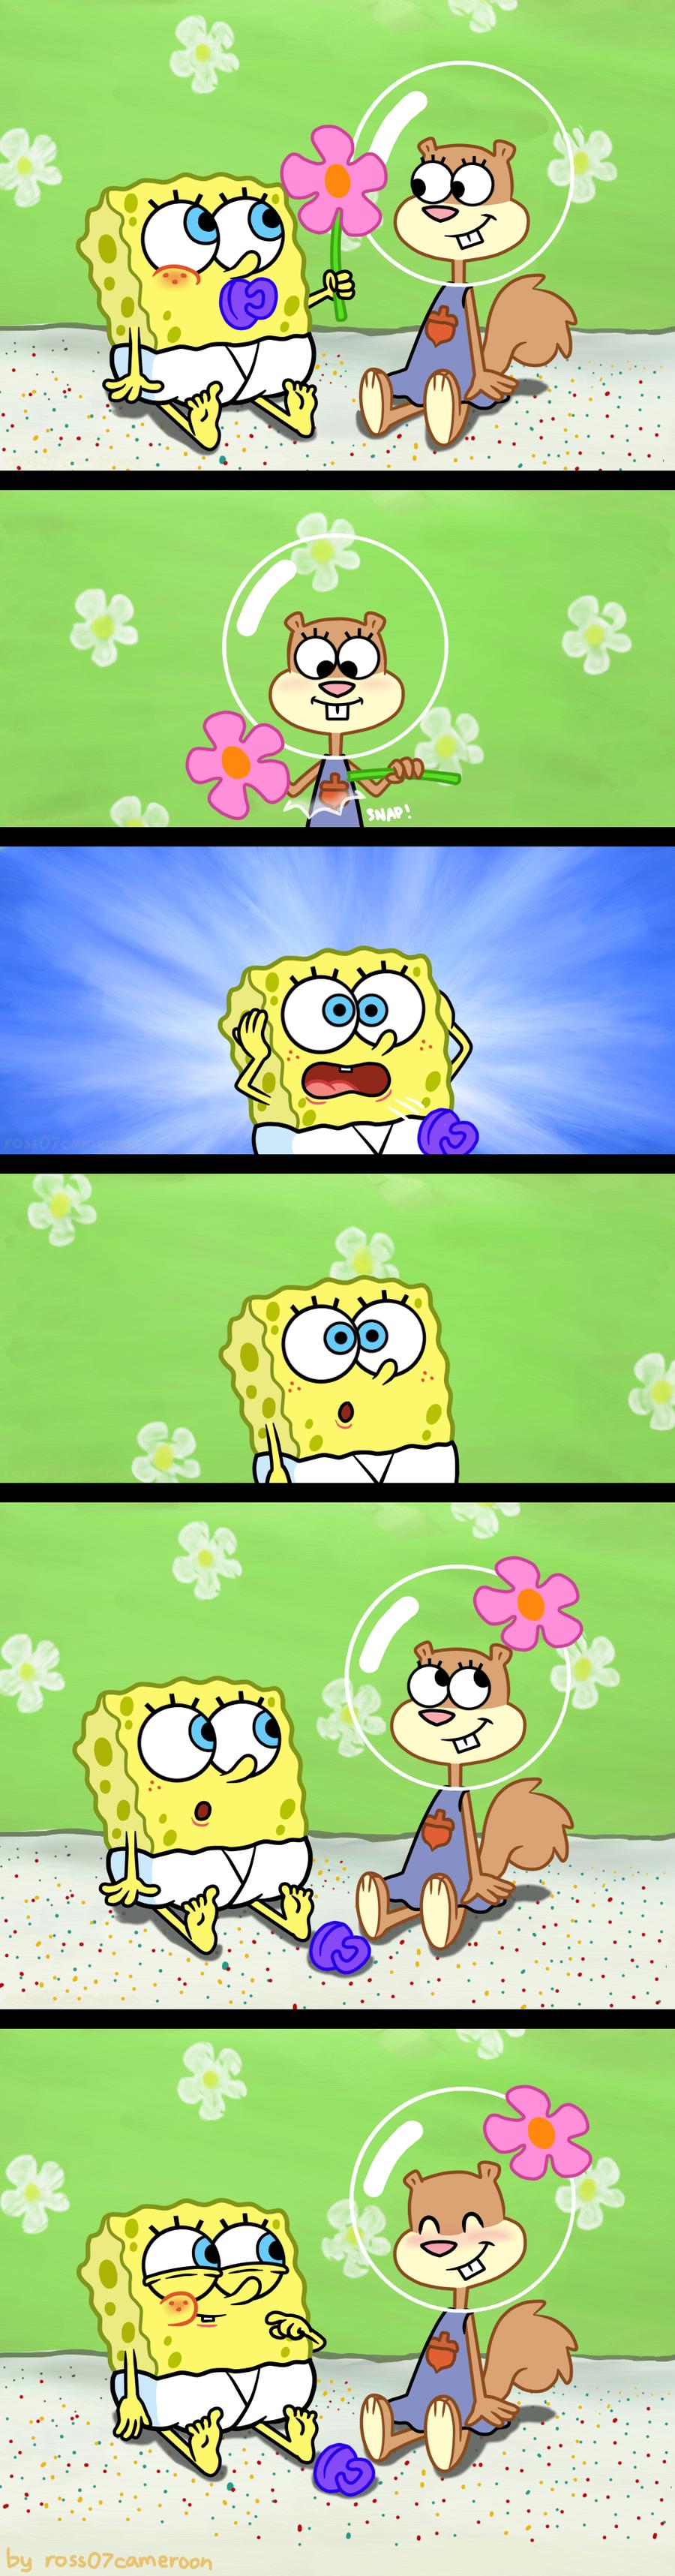 Random flower mini comic by ross07cameroon deviantart com on deviantart